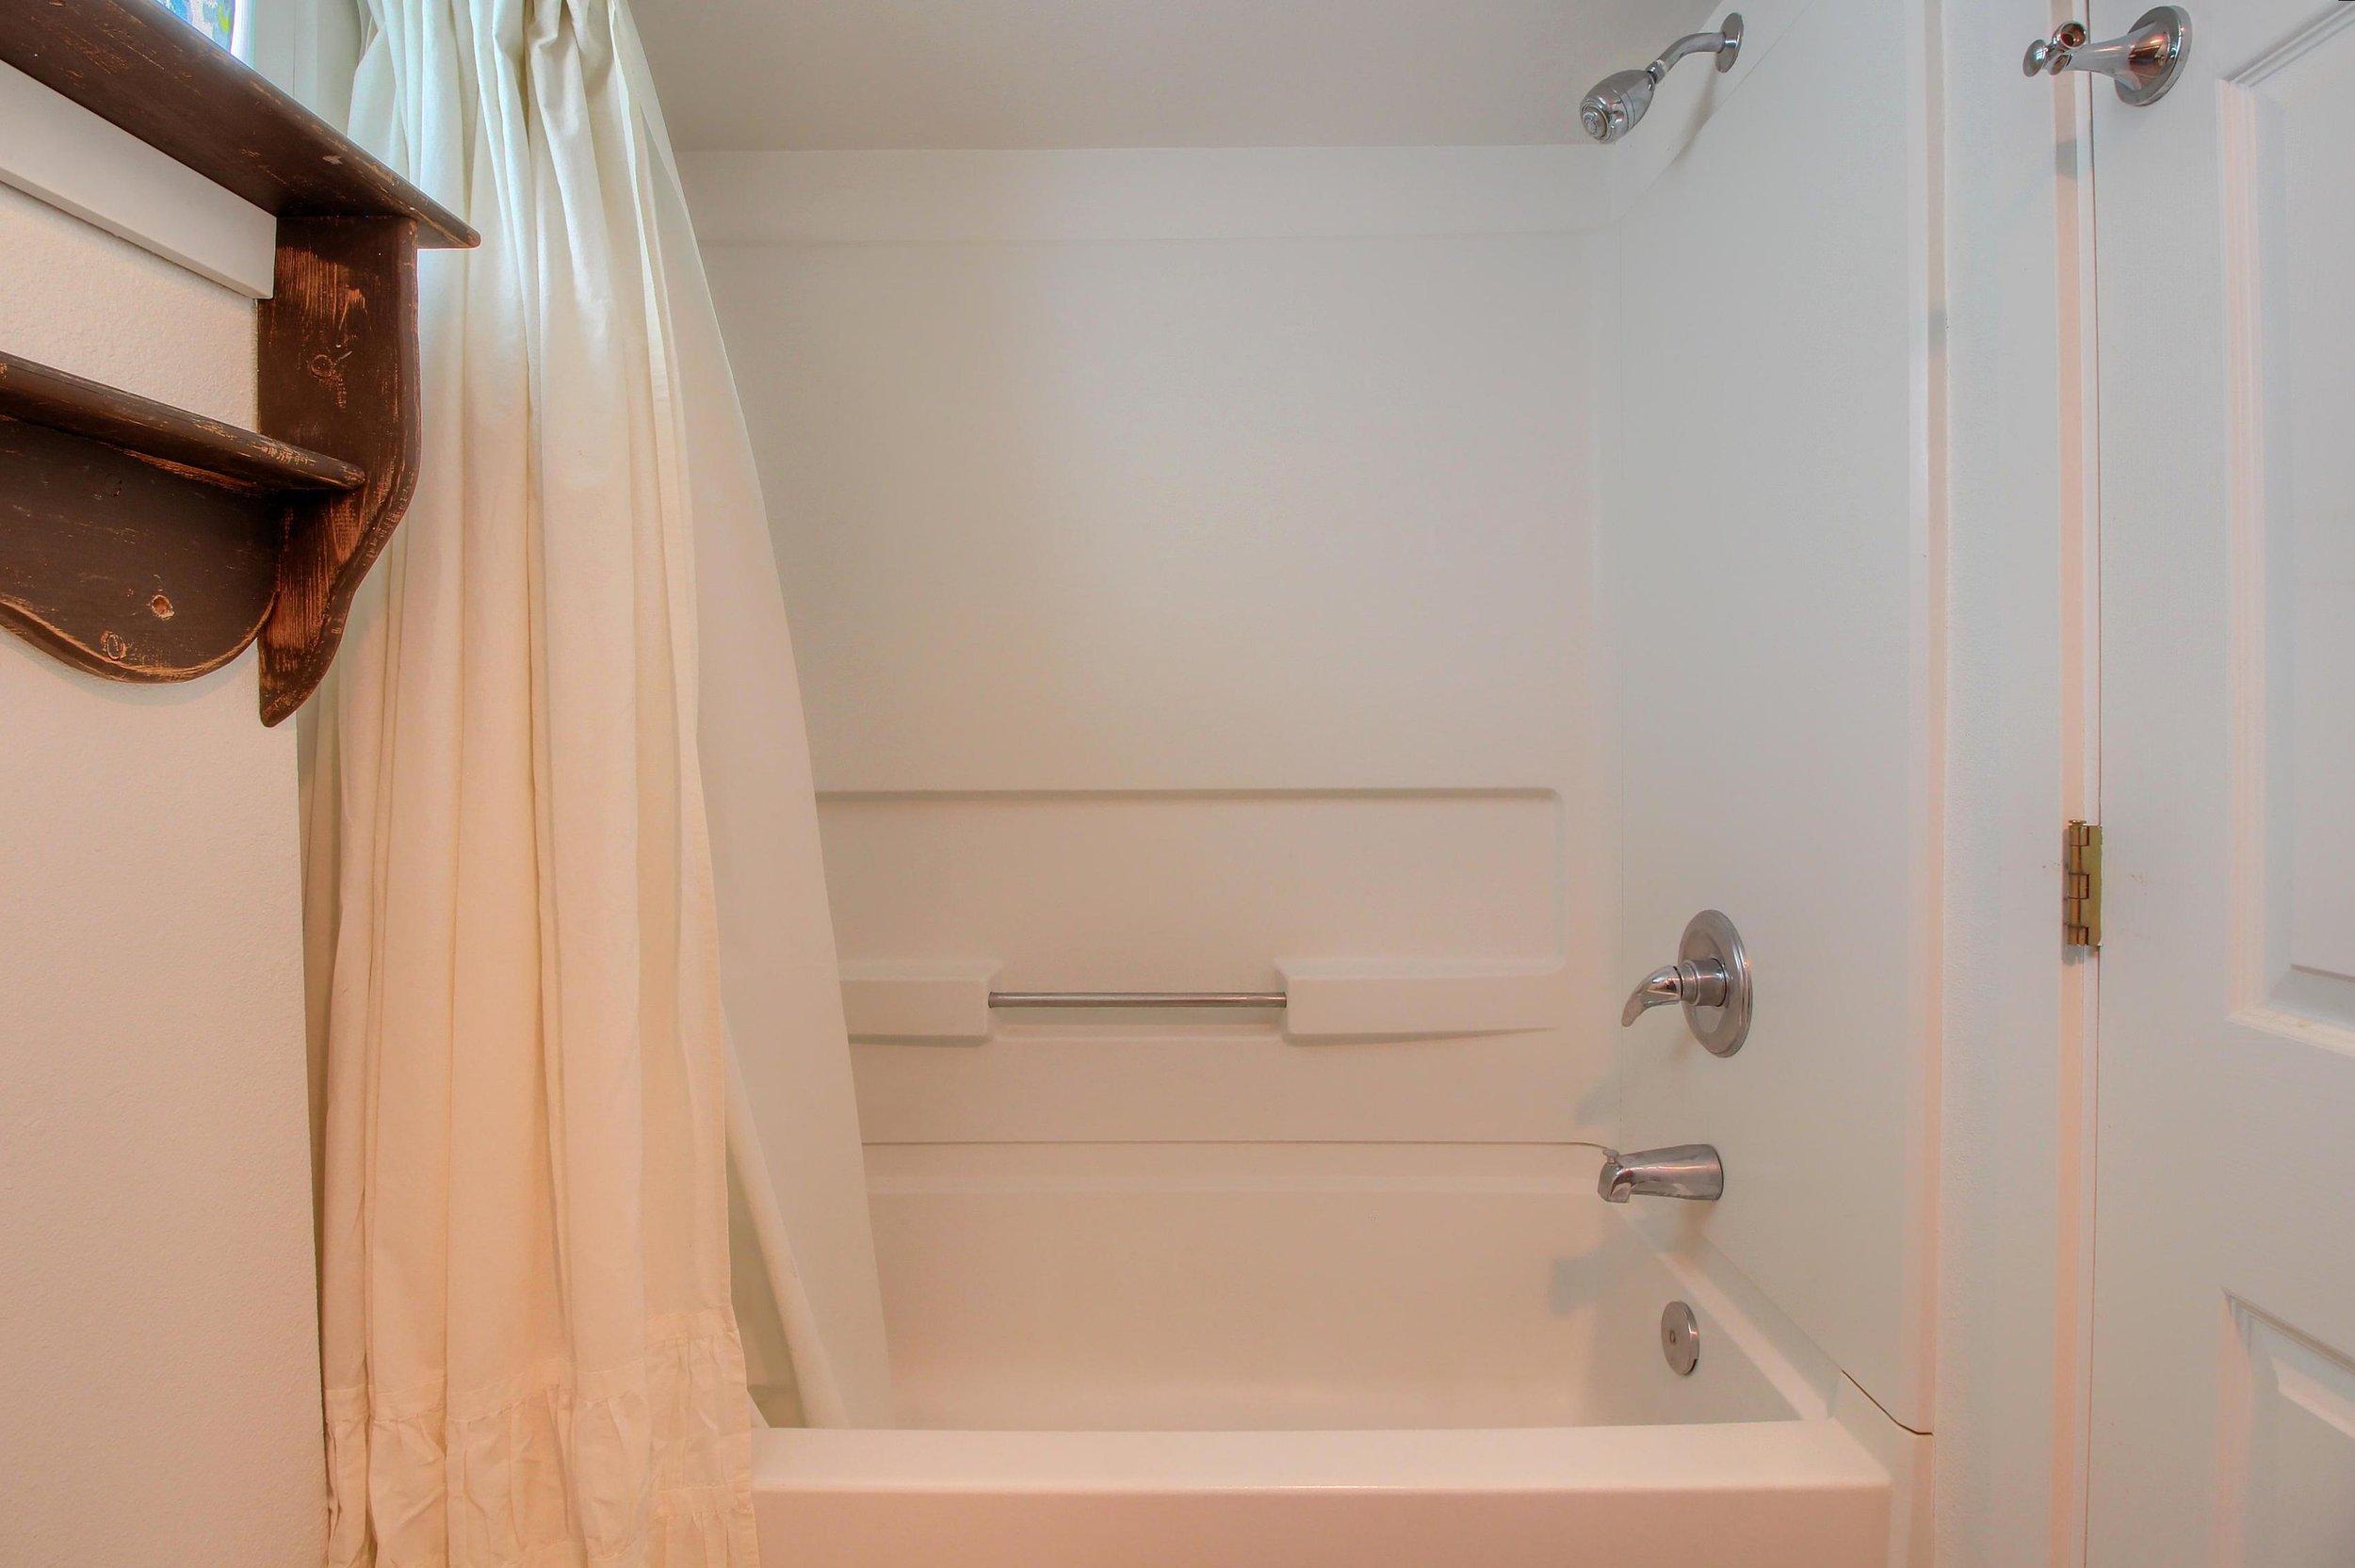 07_Bathroom_IMG_1091.JPG